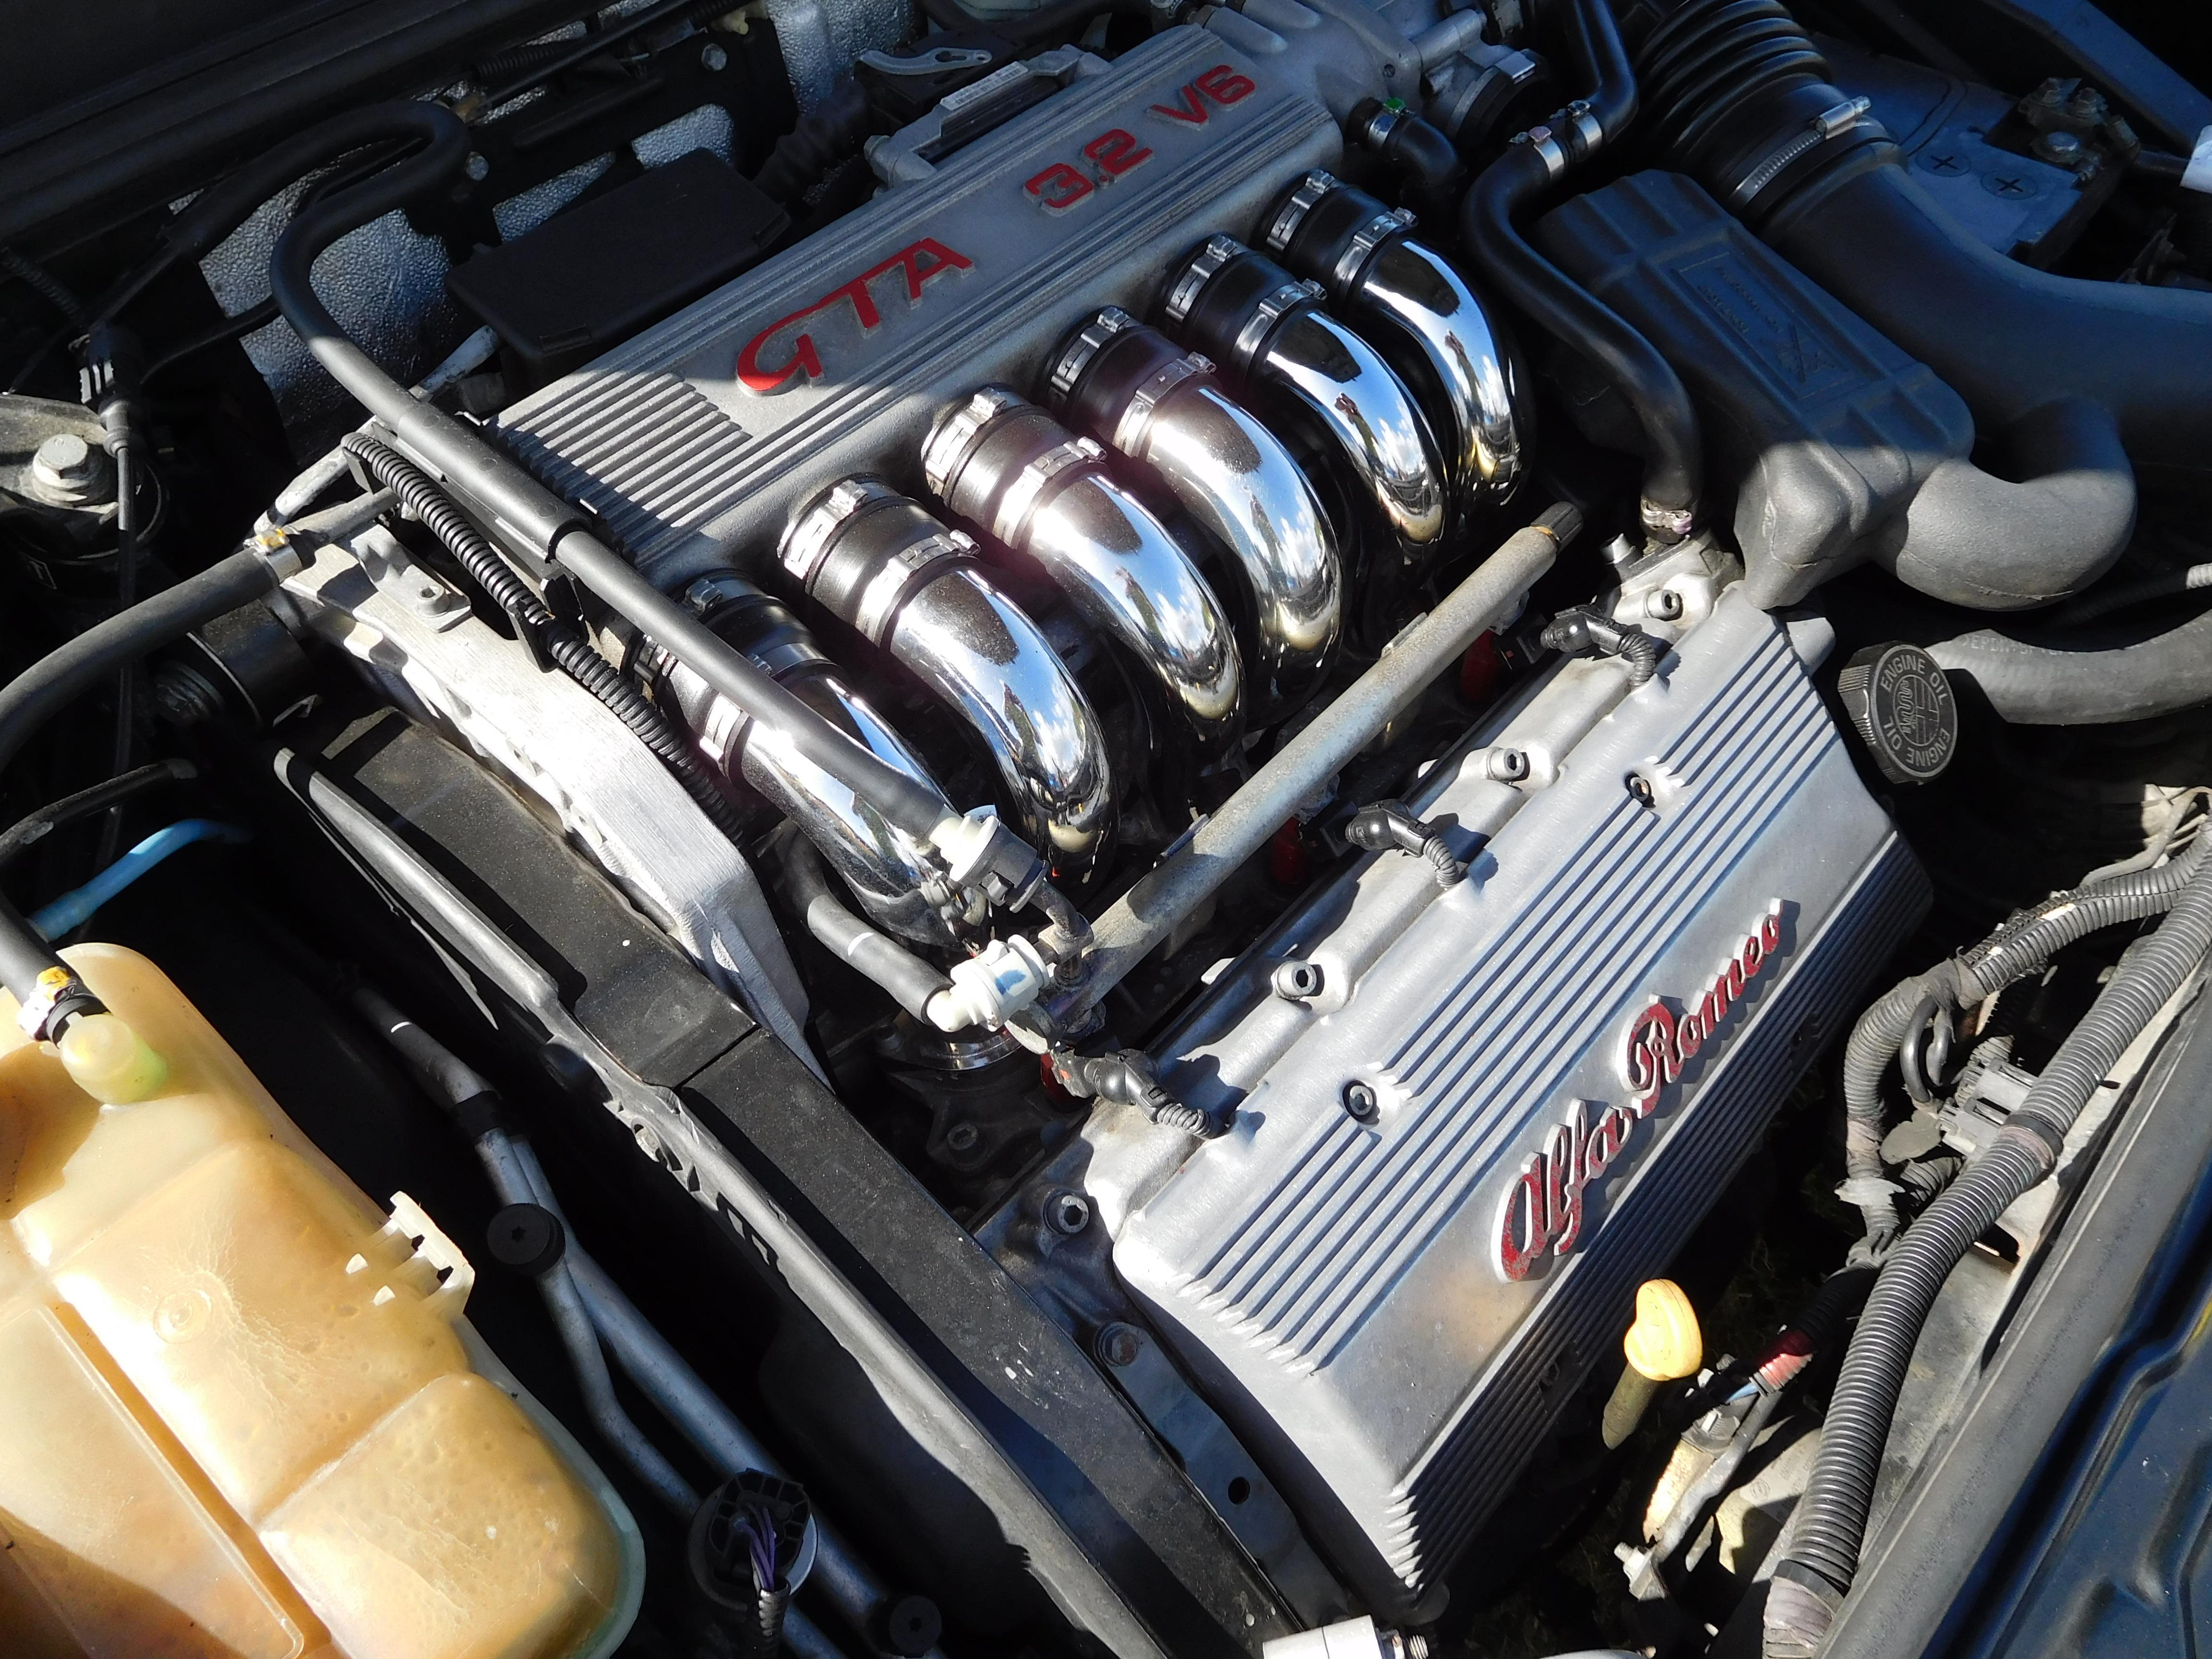 File Alfa Romeo 147 Gta 3 Engine Jpg Wikimedia Commons